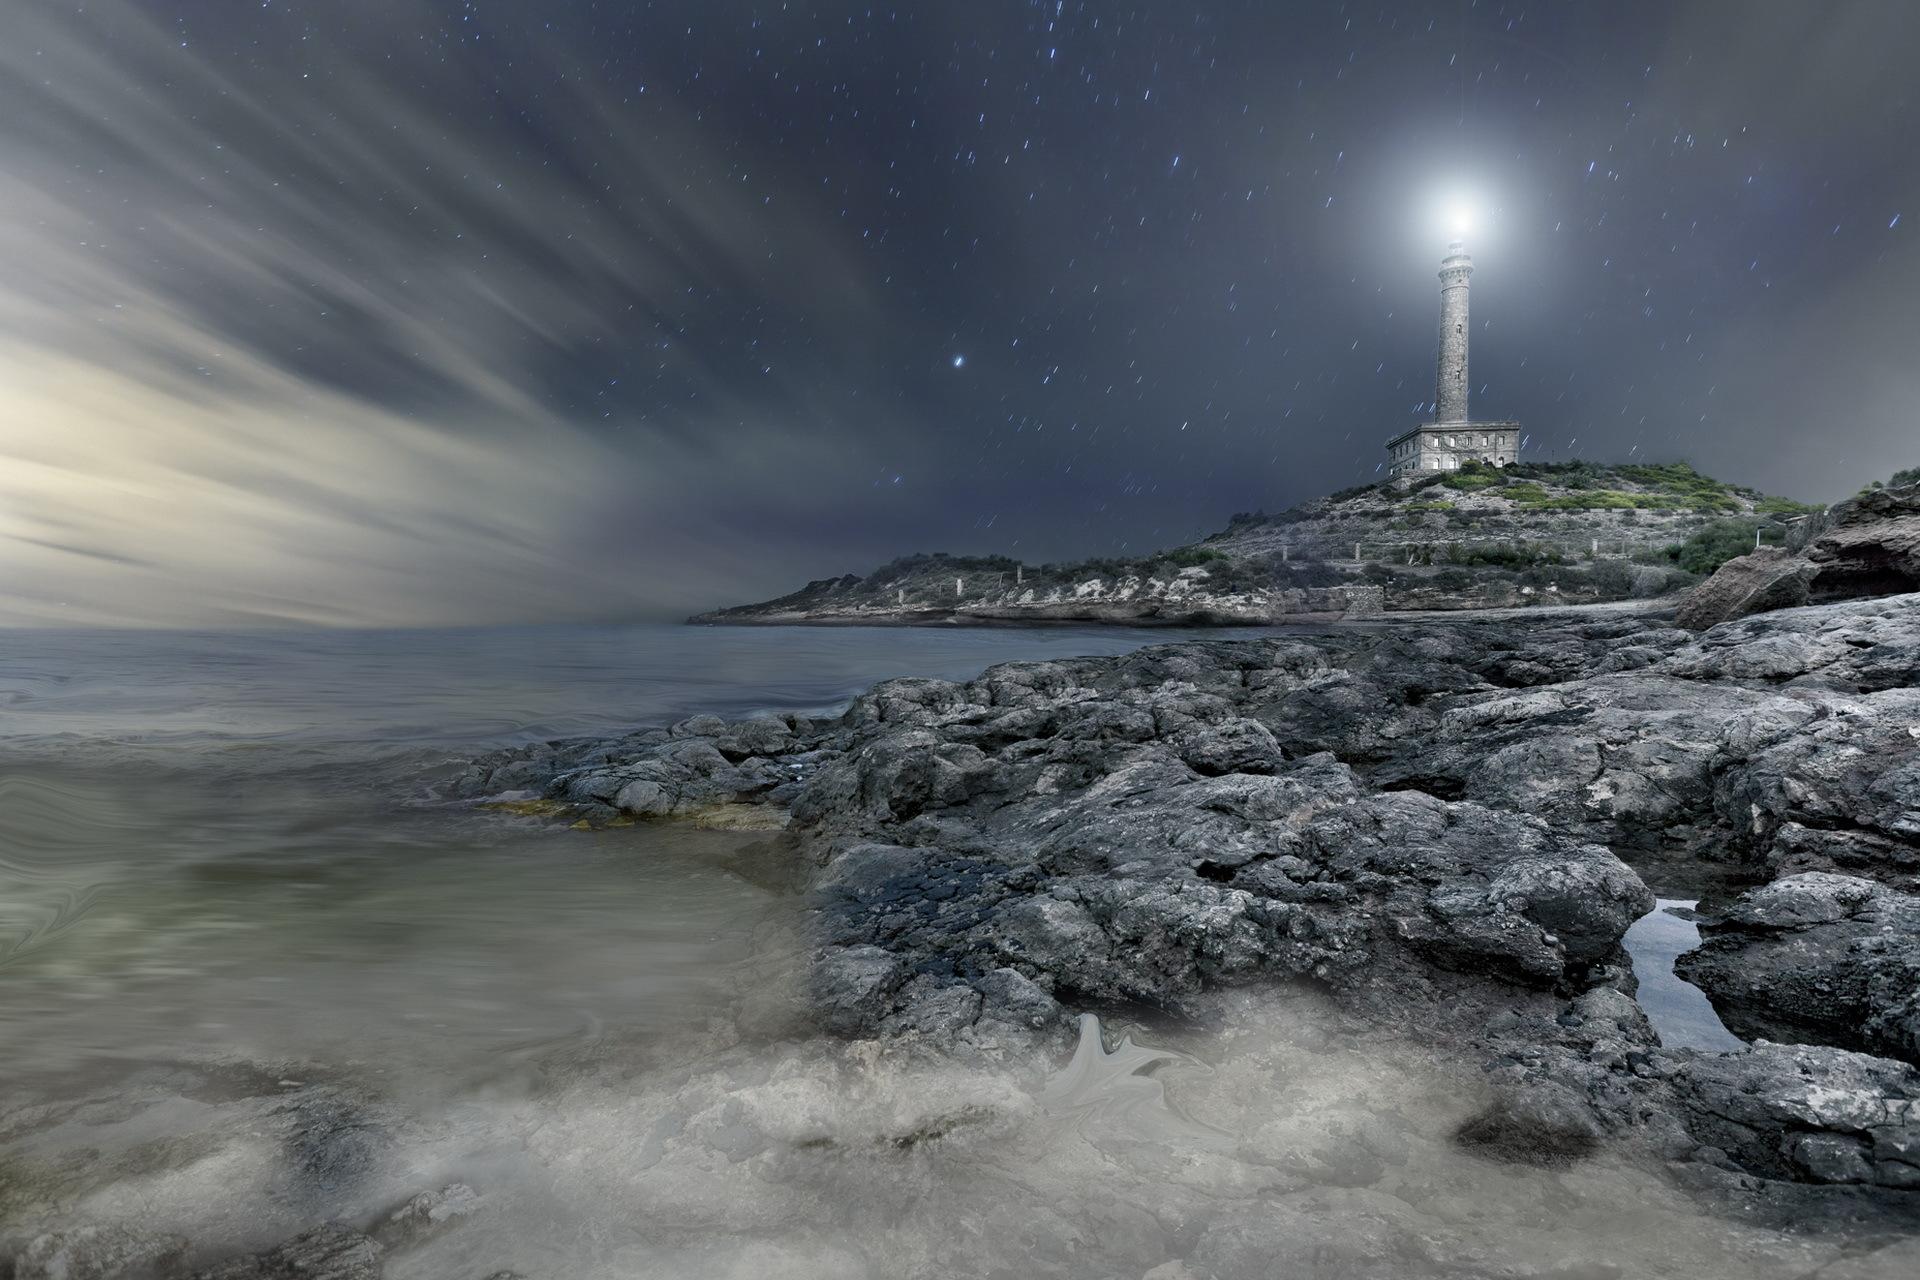 lighthouse at night - HD1680×1050